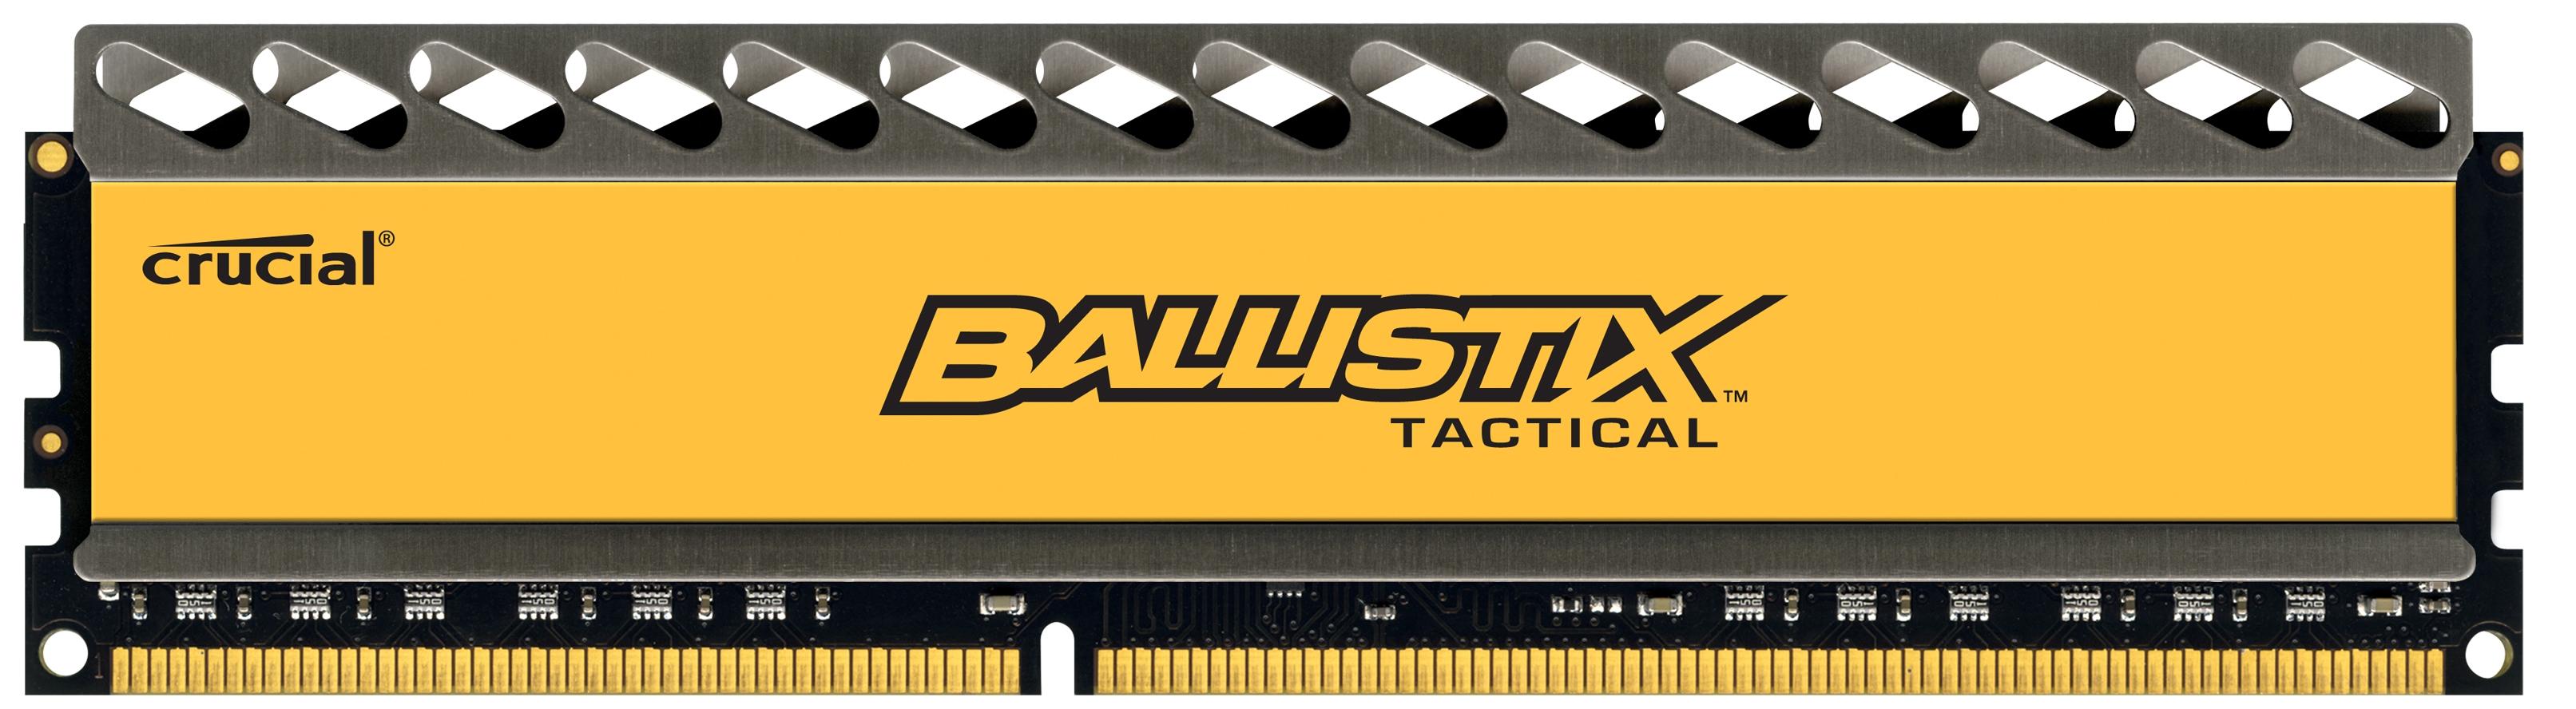 ballistix240-pindimmballistixtacticalddr3-0.jpg